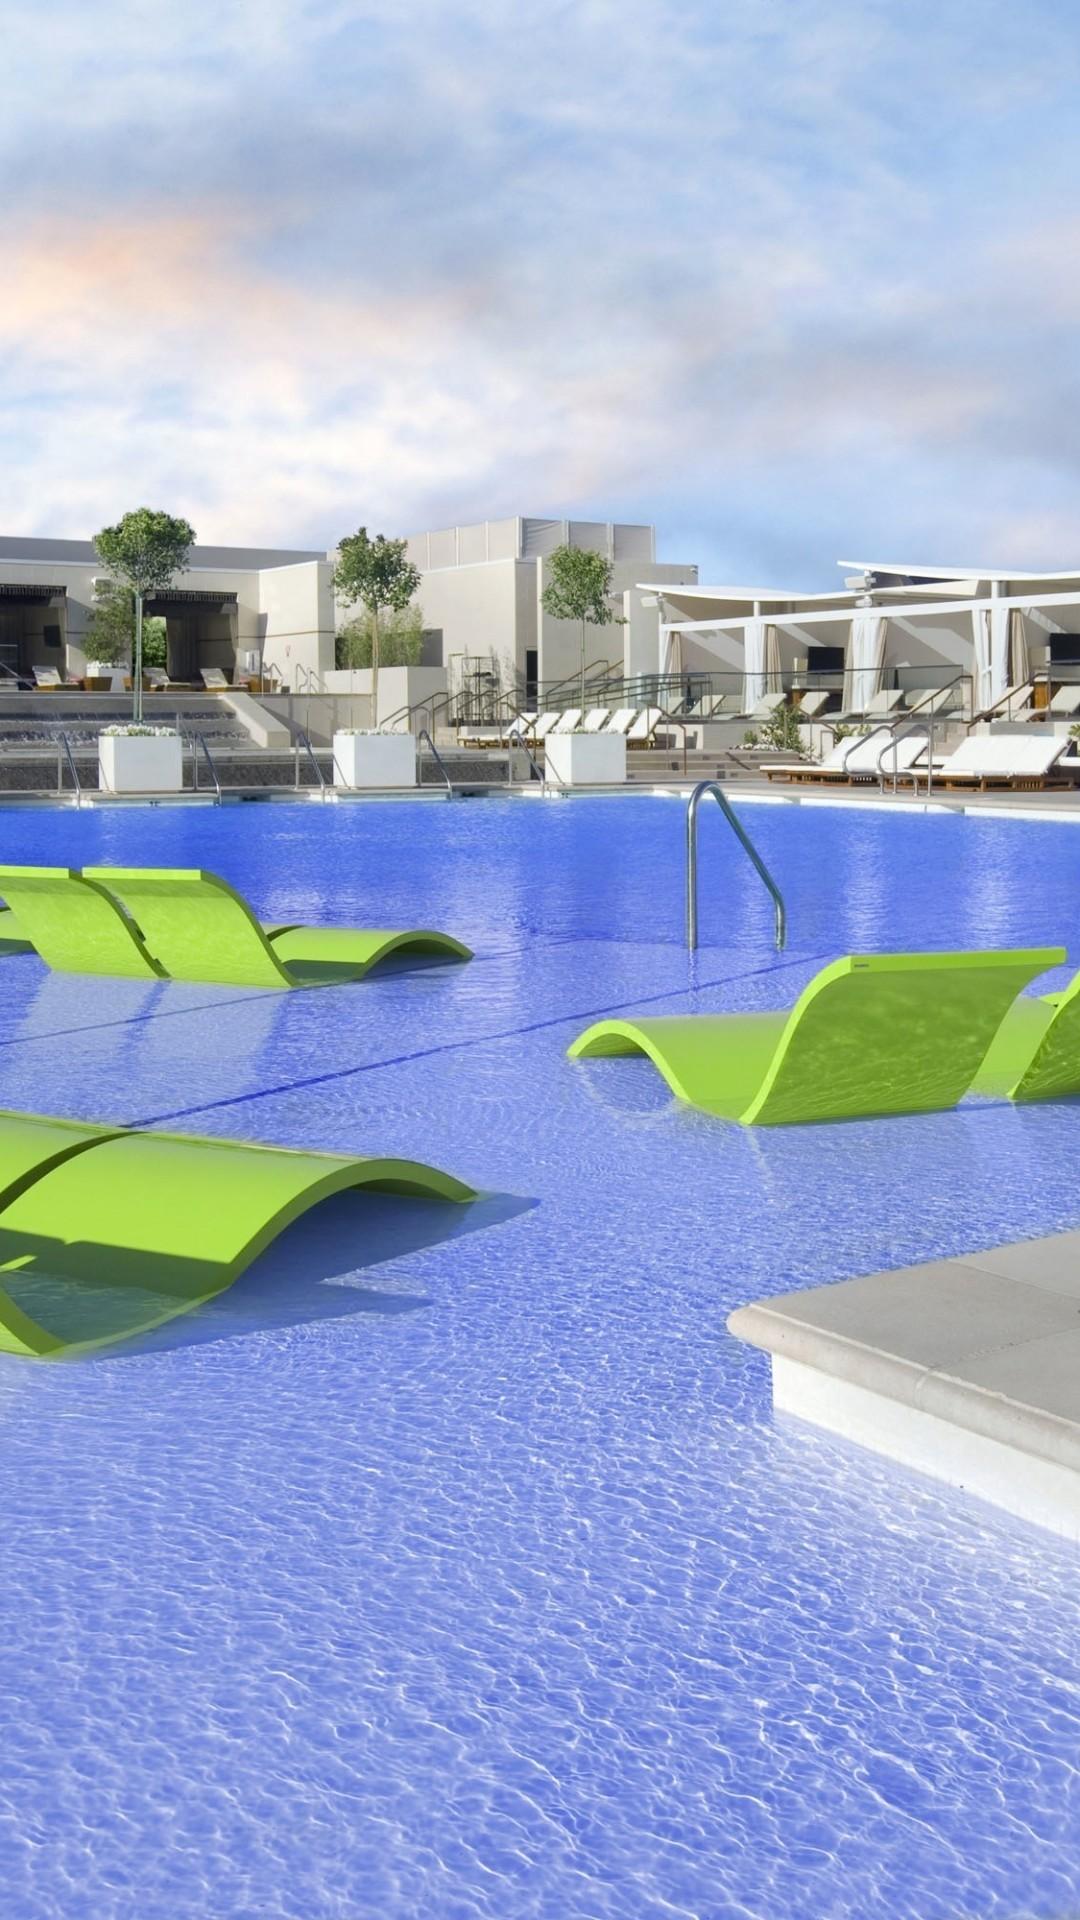 Wallpaper Wet Republic Las Vegas, The Best Hotel Pools